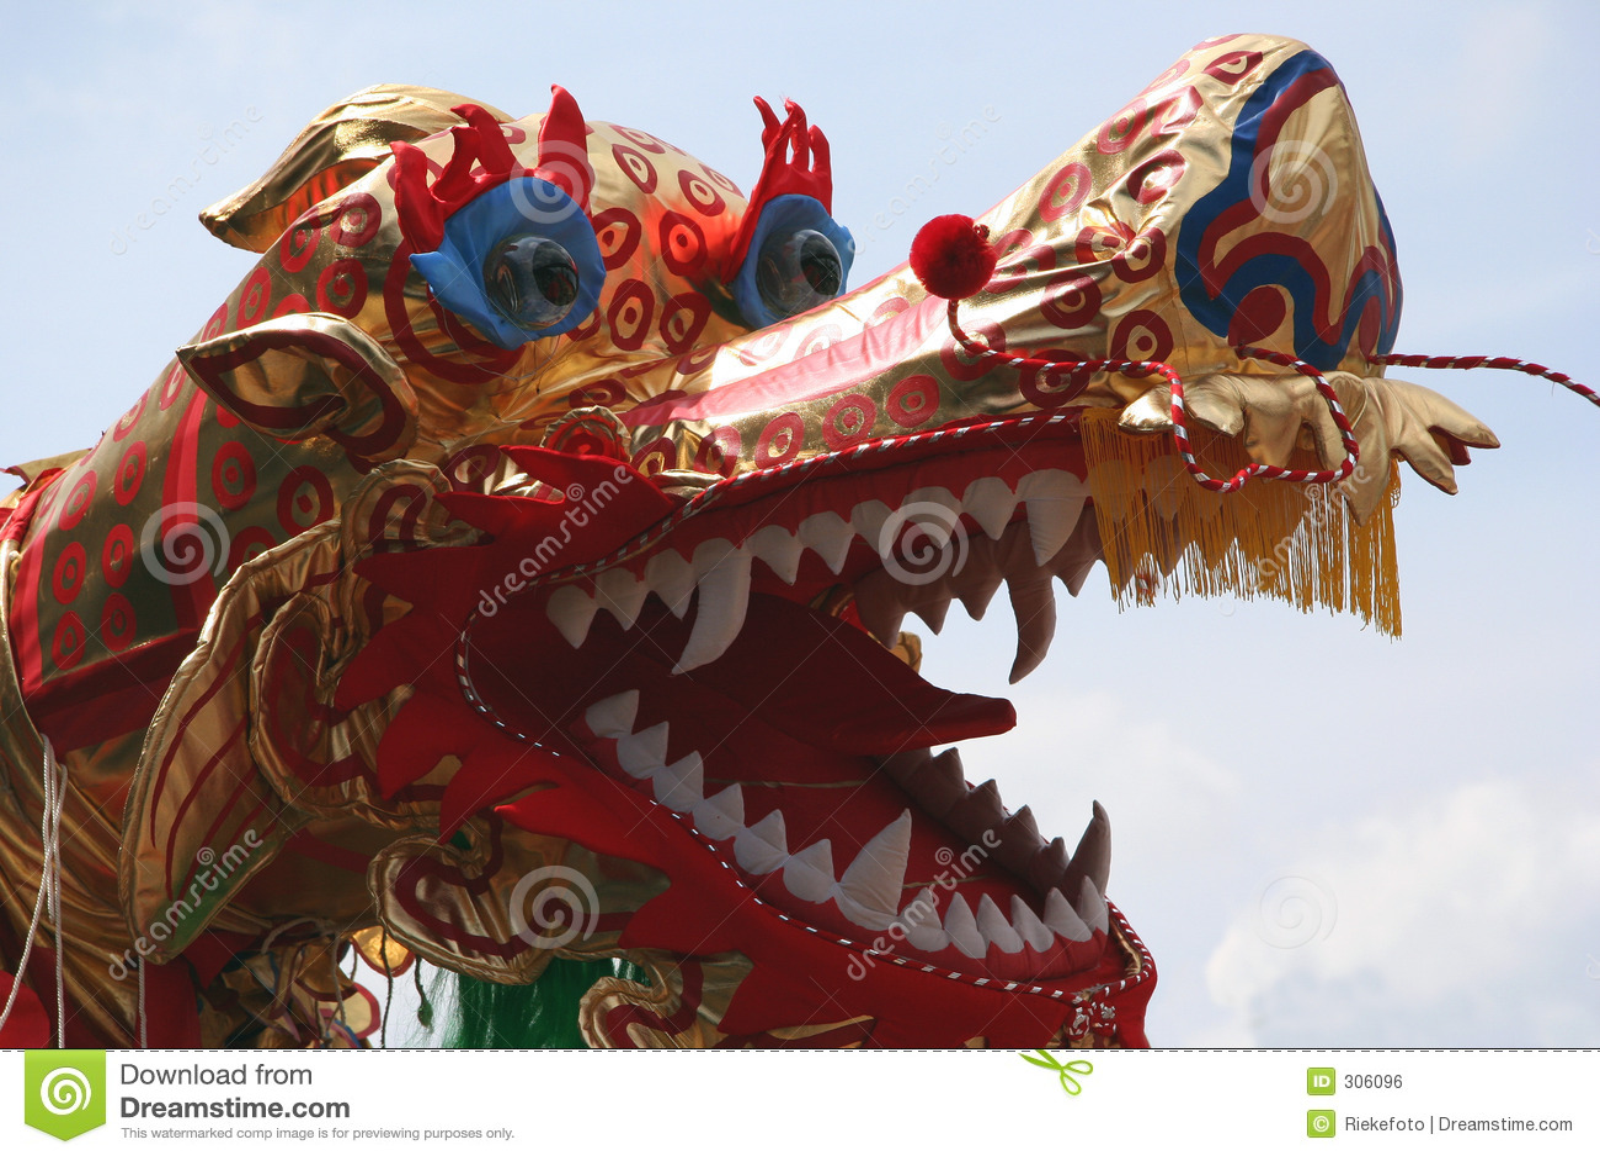 Chiński smok tańca